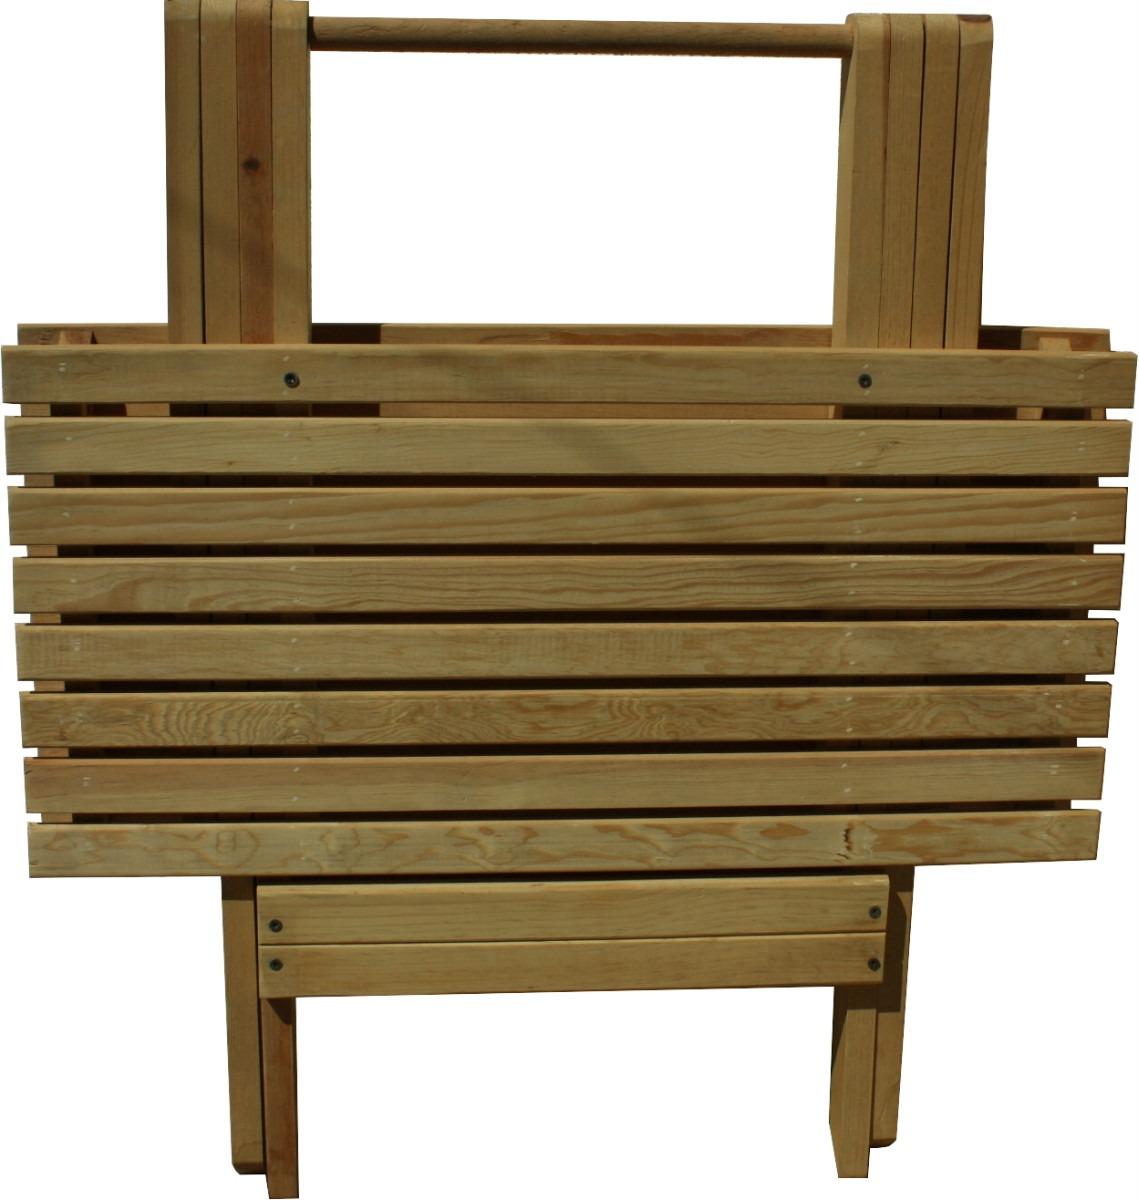 Mesa de jard n mueble plegable madera jardin o interiores - Muebles exterior madera ...